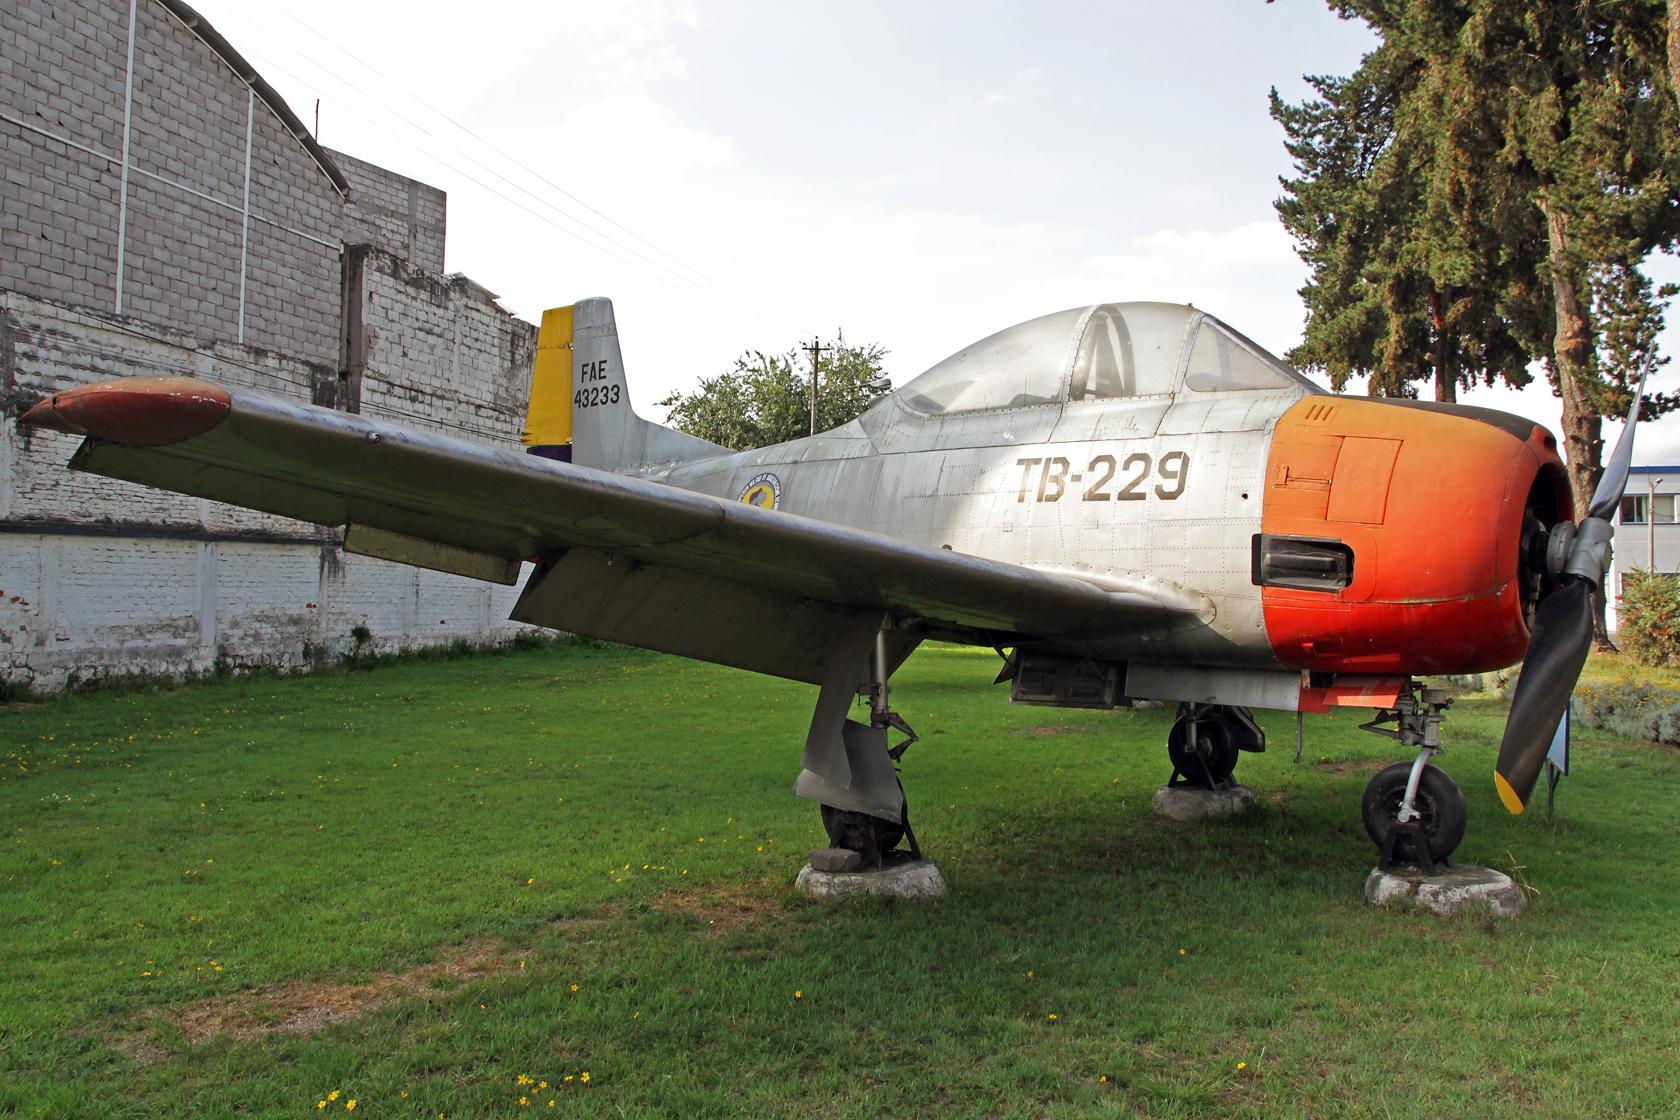 Fuerza Aérea Ecuatoriana North American T-28D Trojan FAE-43233